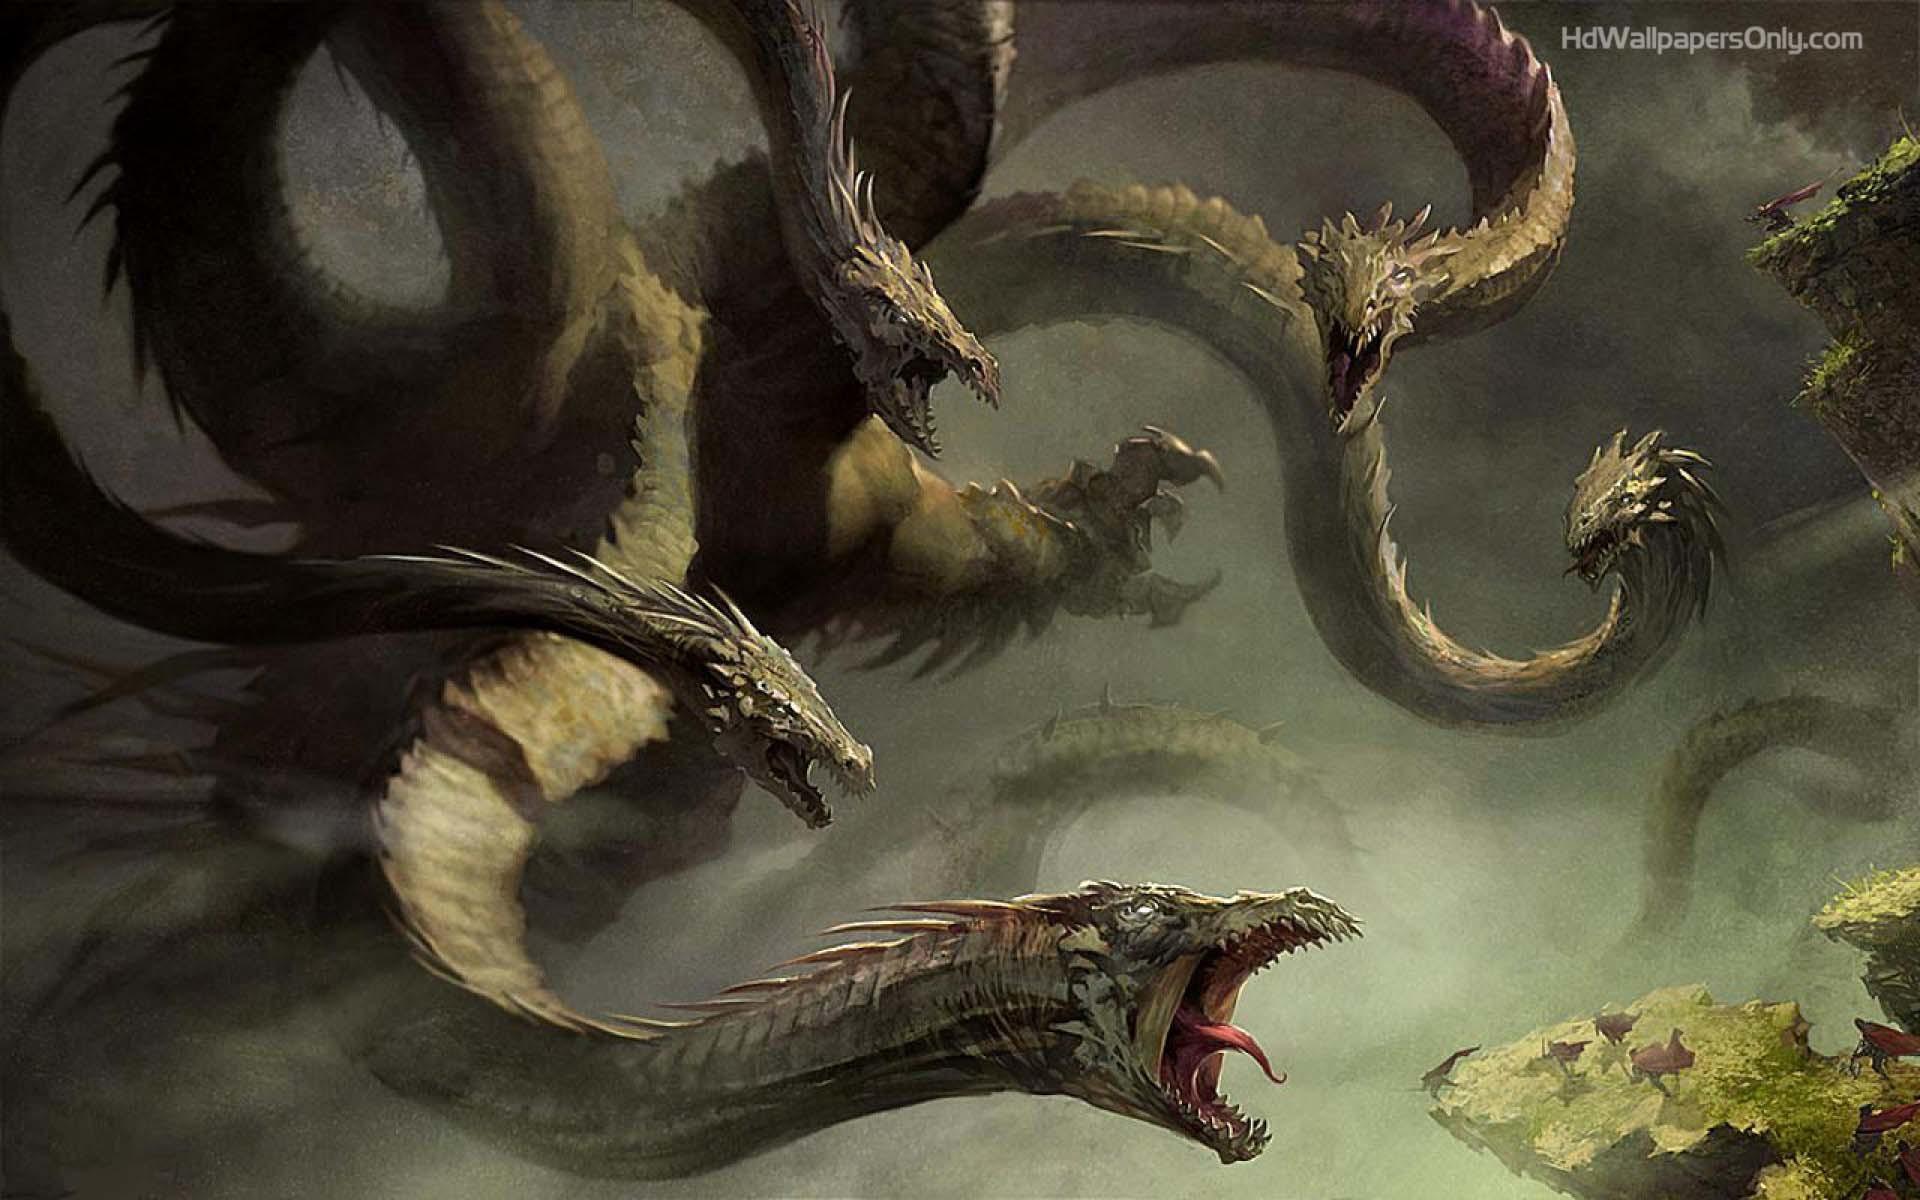 Dragon 5 Head Wallpapers HD.